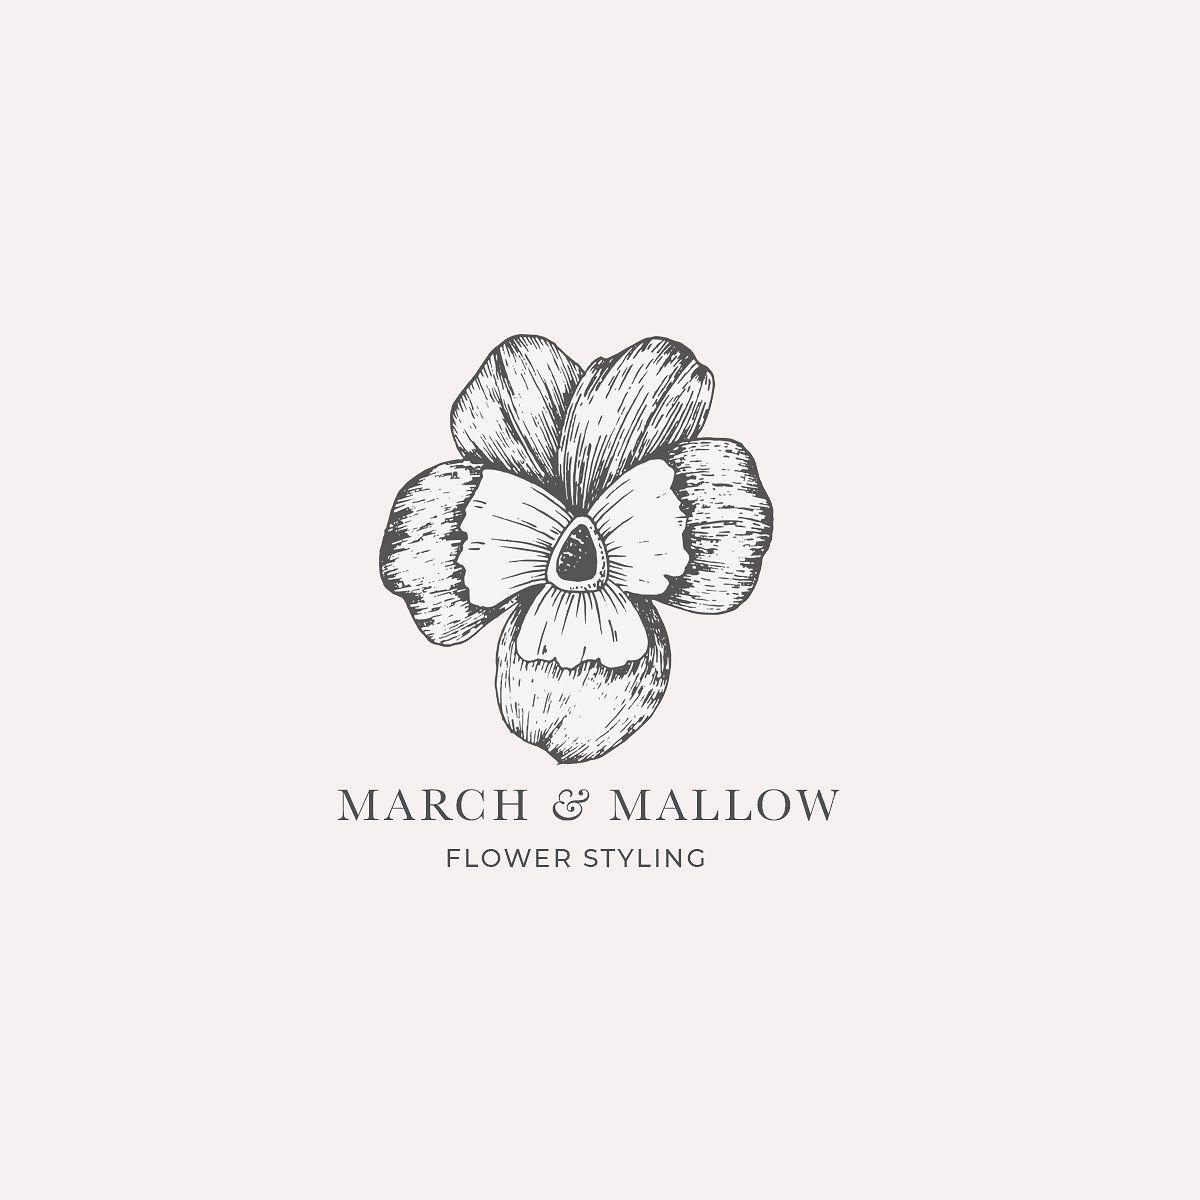 Awakening Floral Graphics Amp Letters By Laras Wonderland On